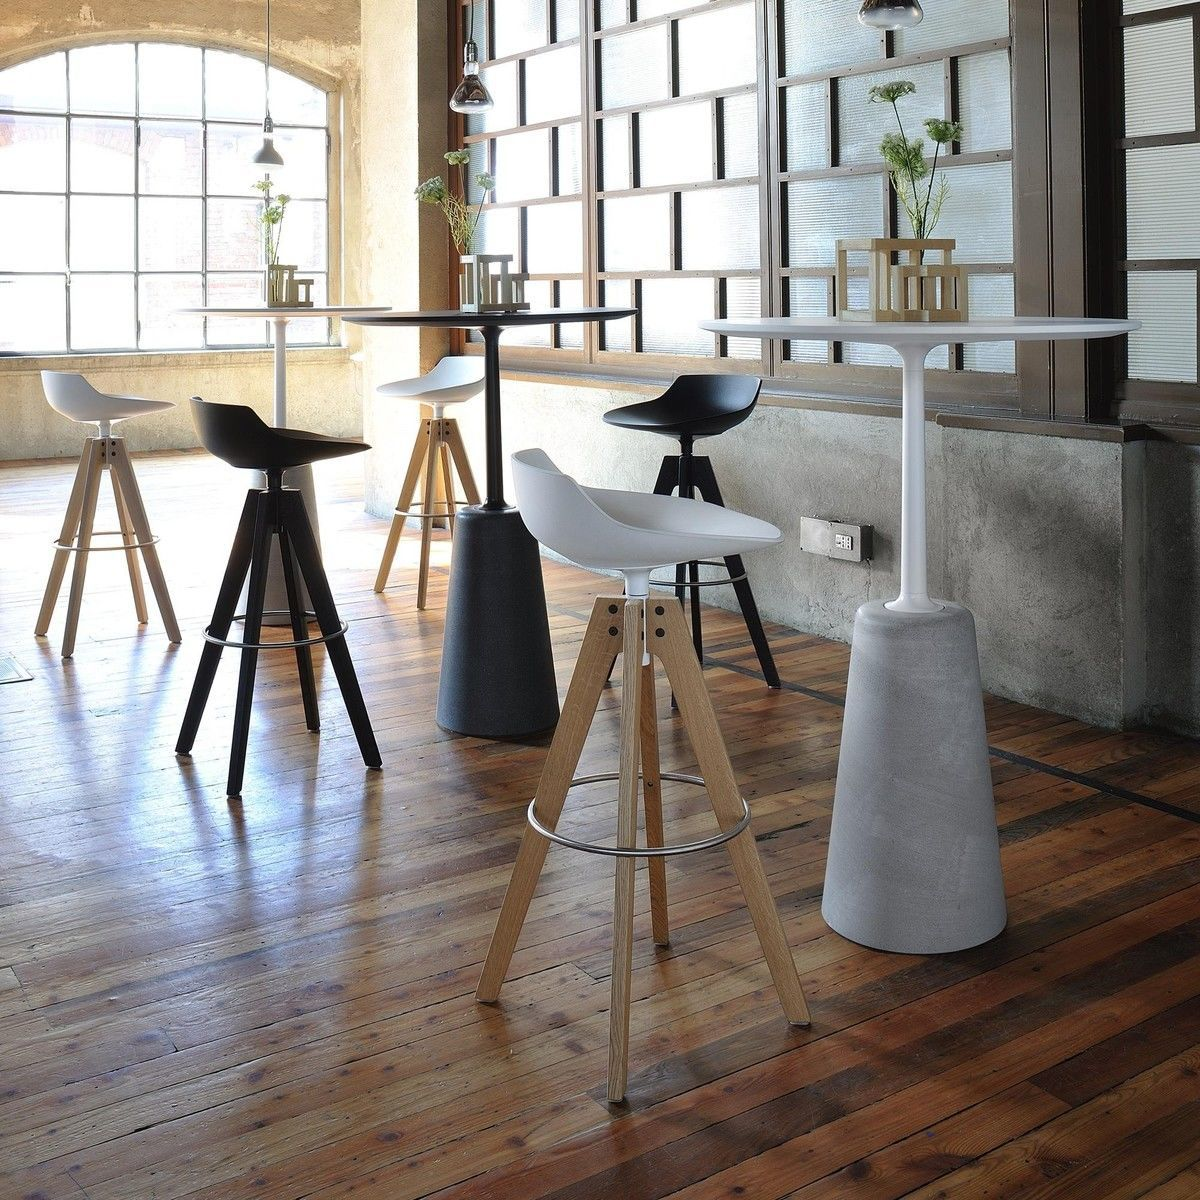 flow tabouret de bar pi tement en ch ne 65cm mdf italia. Black Bedroom Furniture Sets. Home Design Ideas